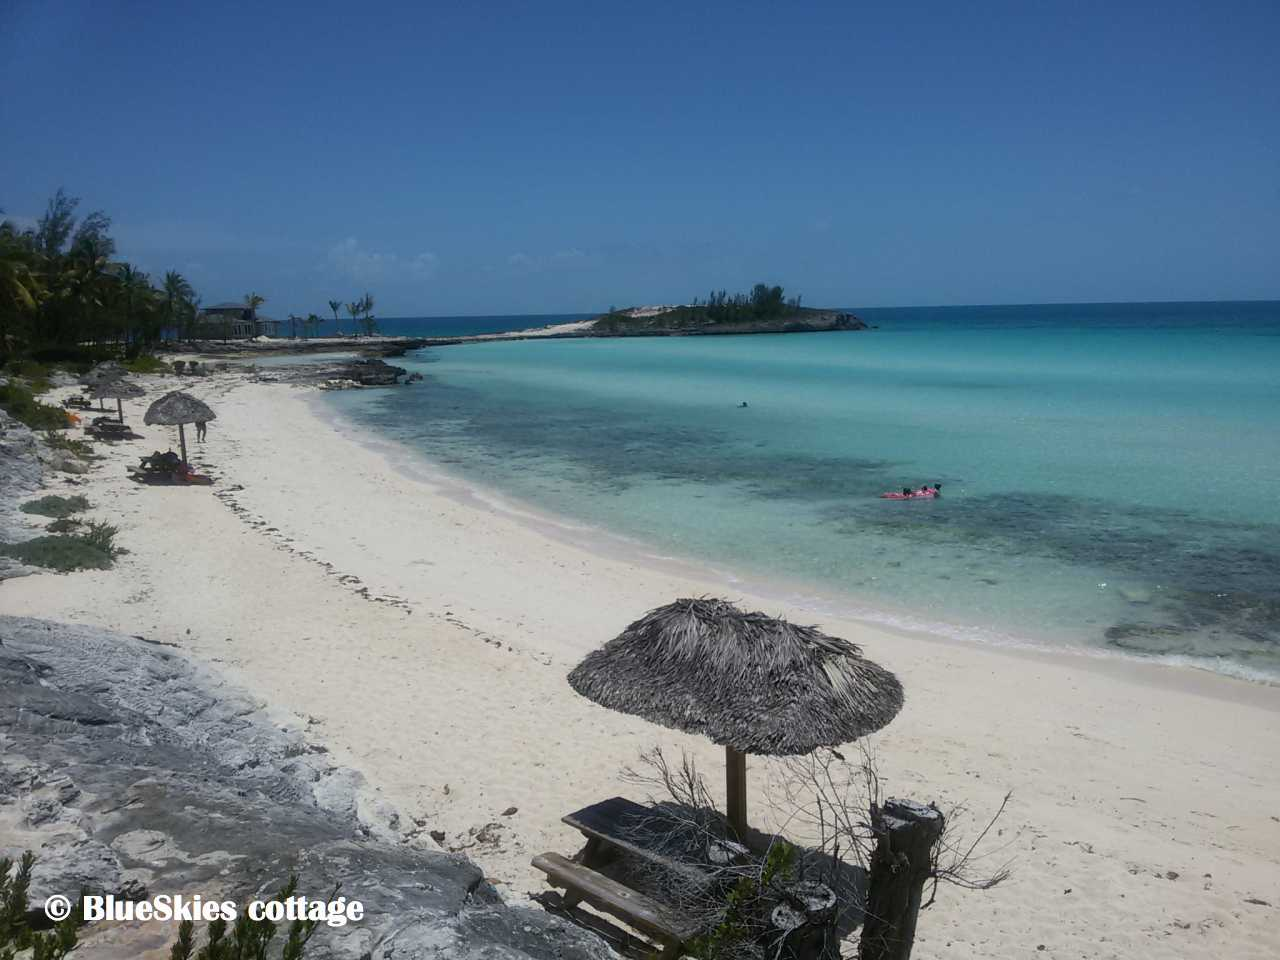 North-Central Eleuthera beaches: Rainbow Bay